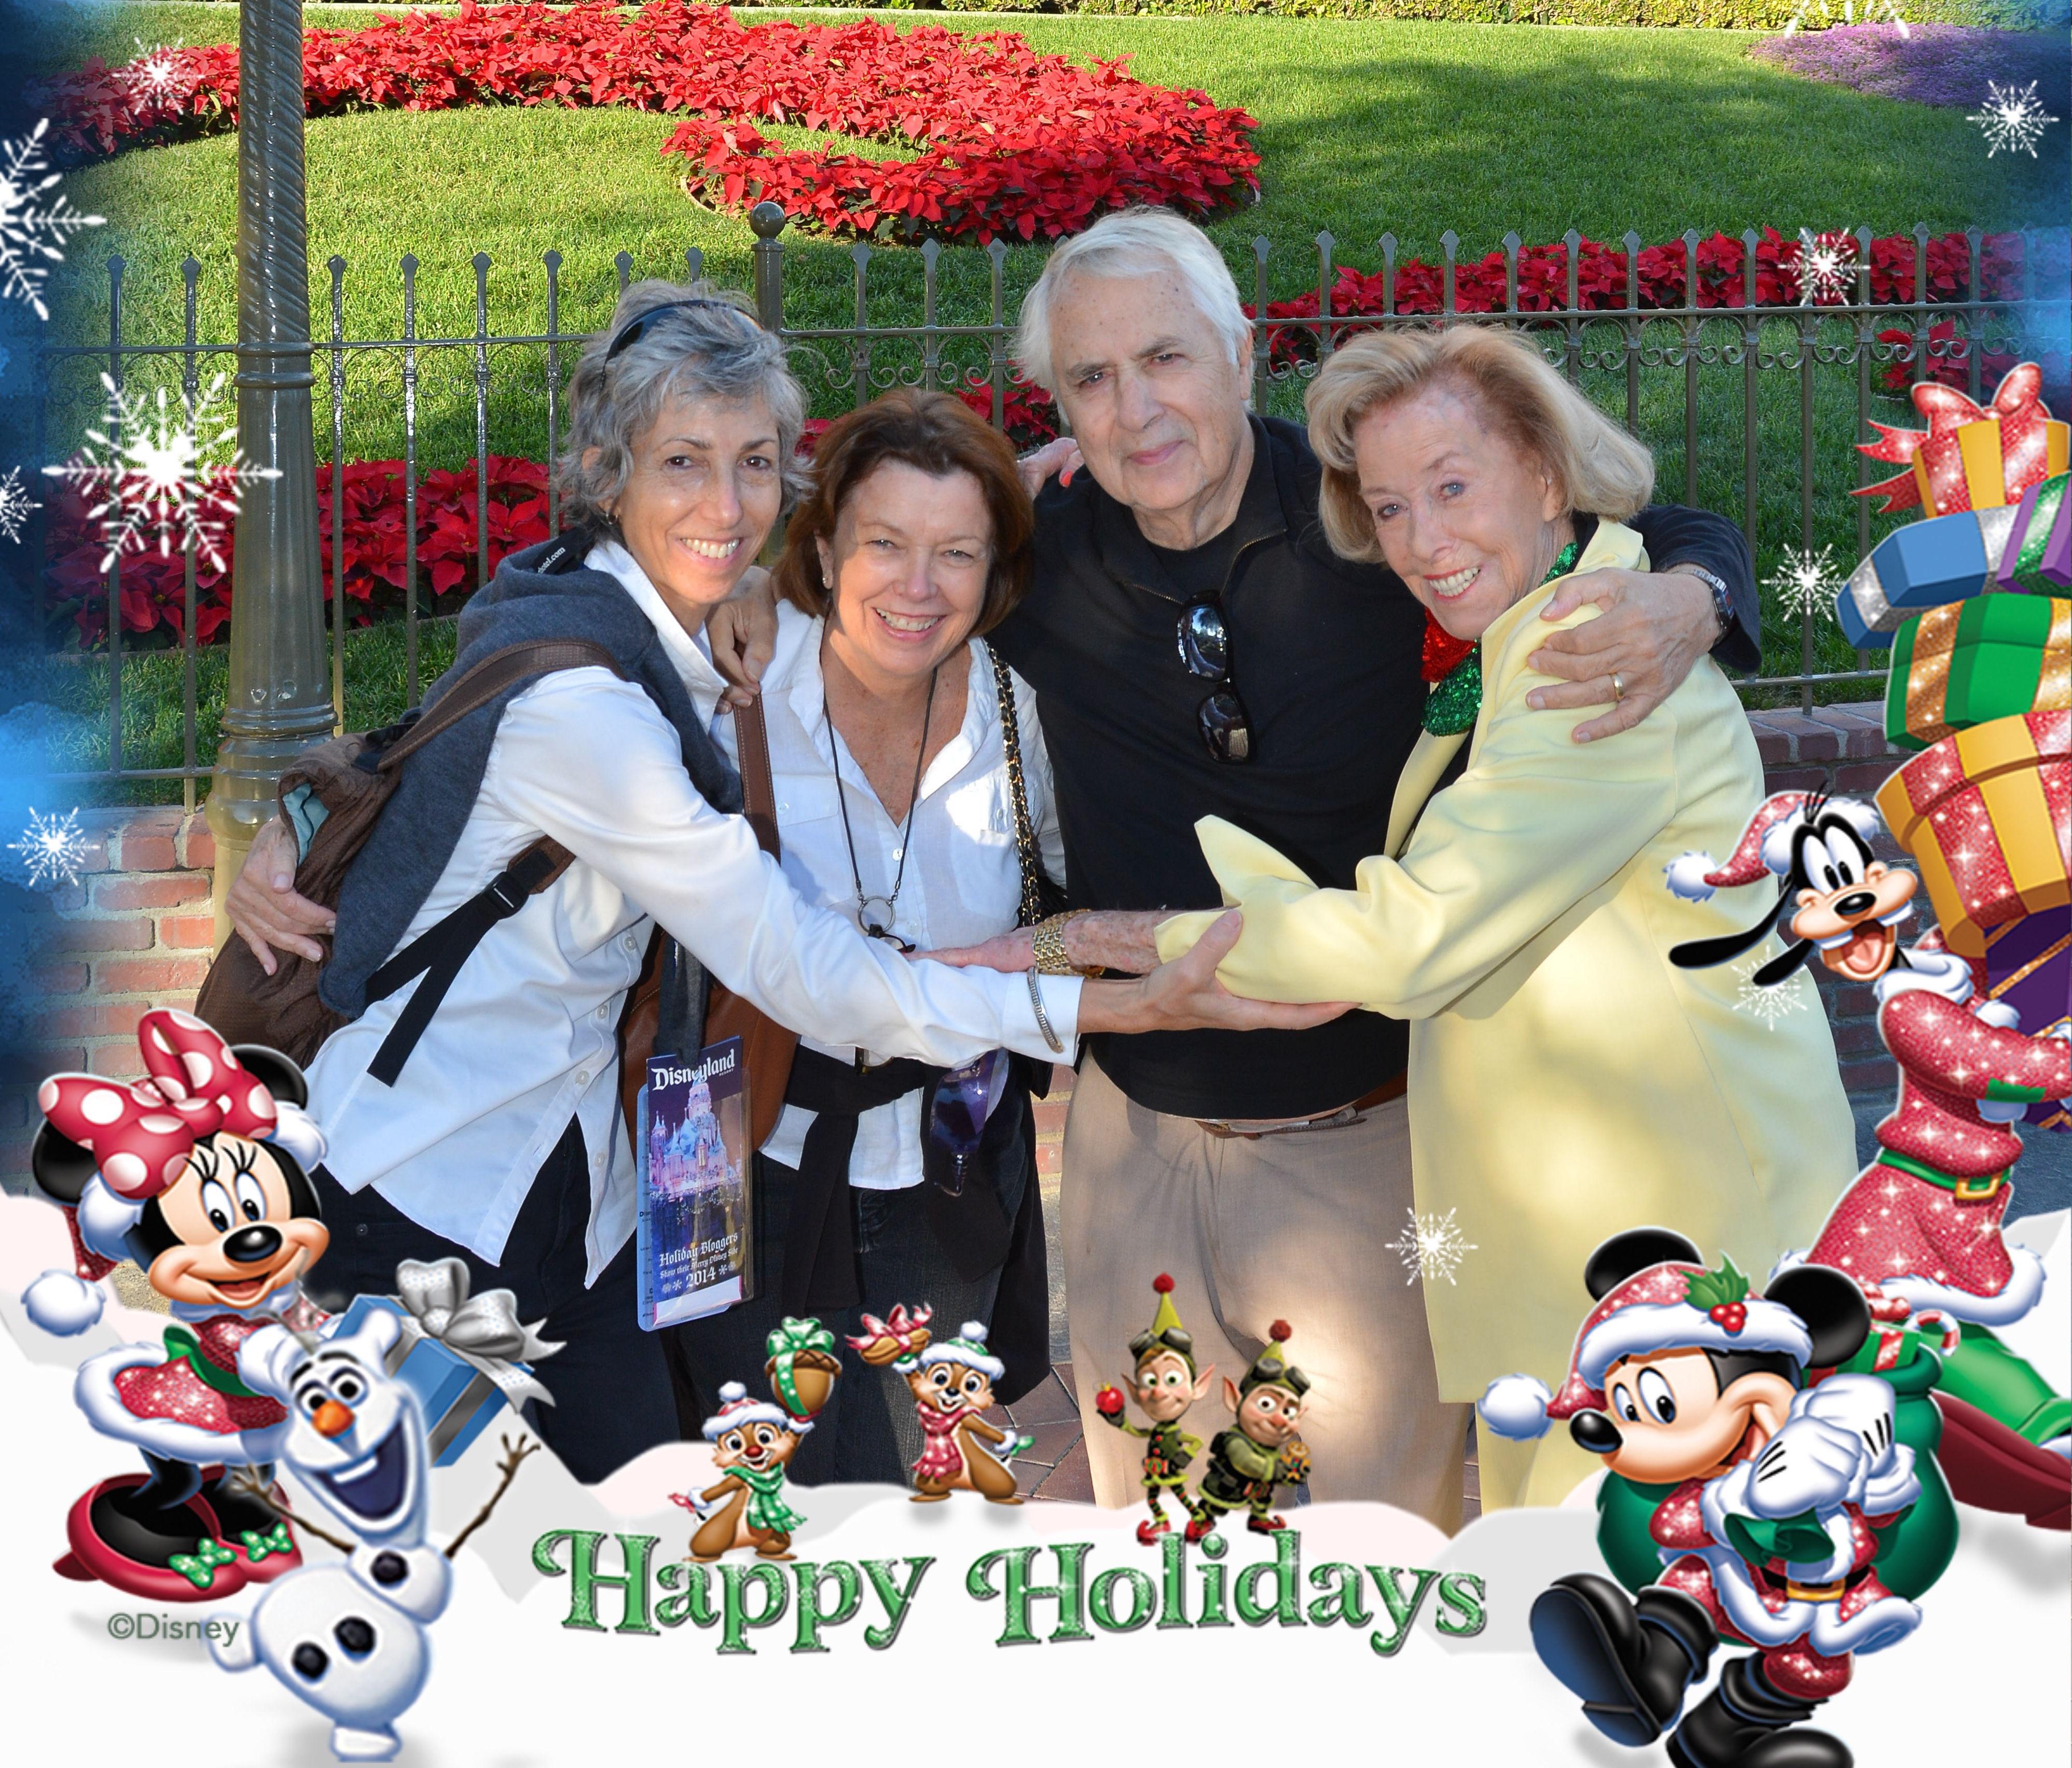 Holidays Disneyland Family Casting – Jerusalem House